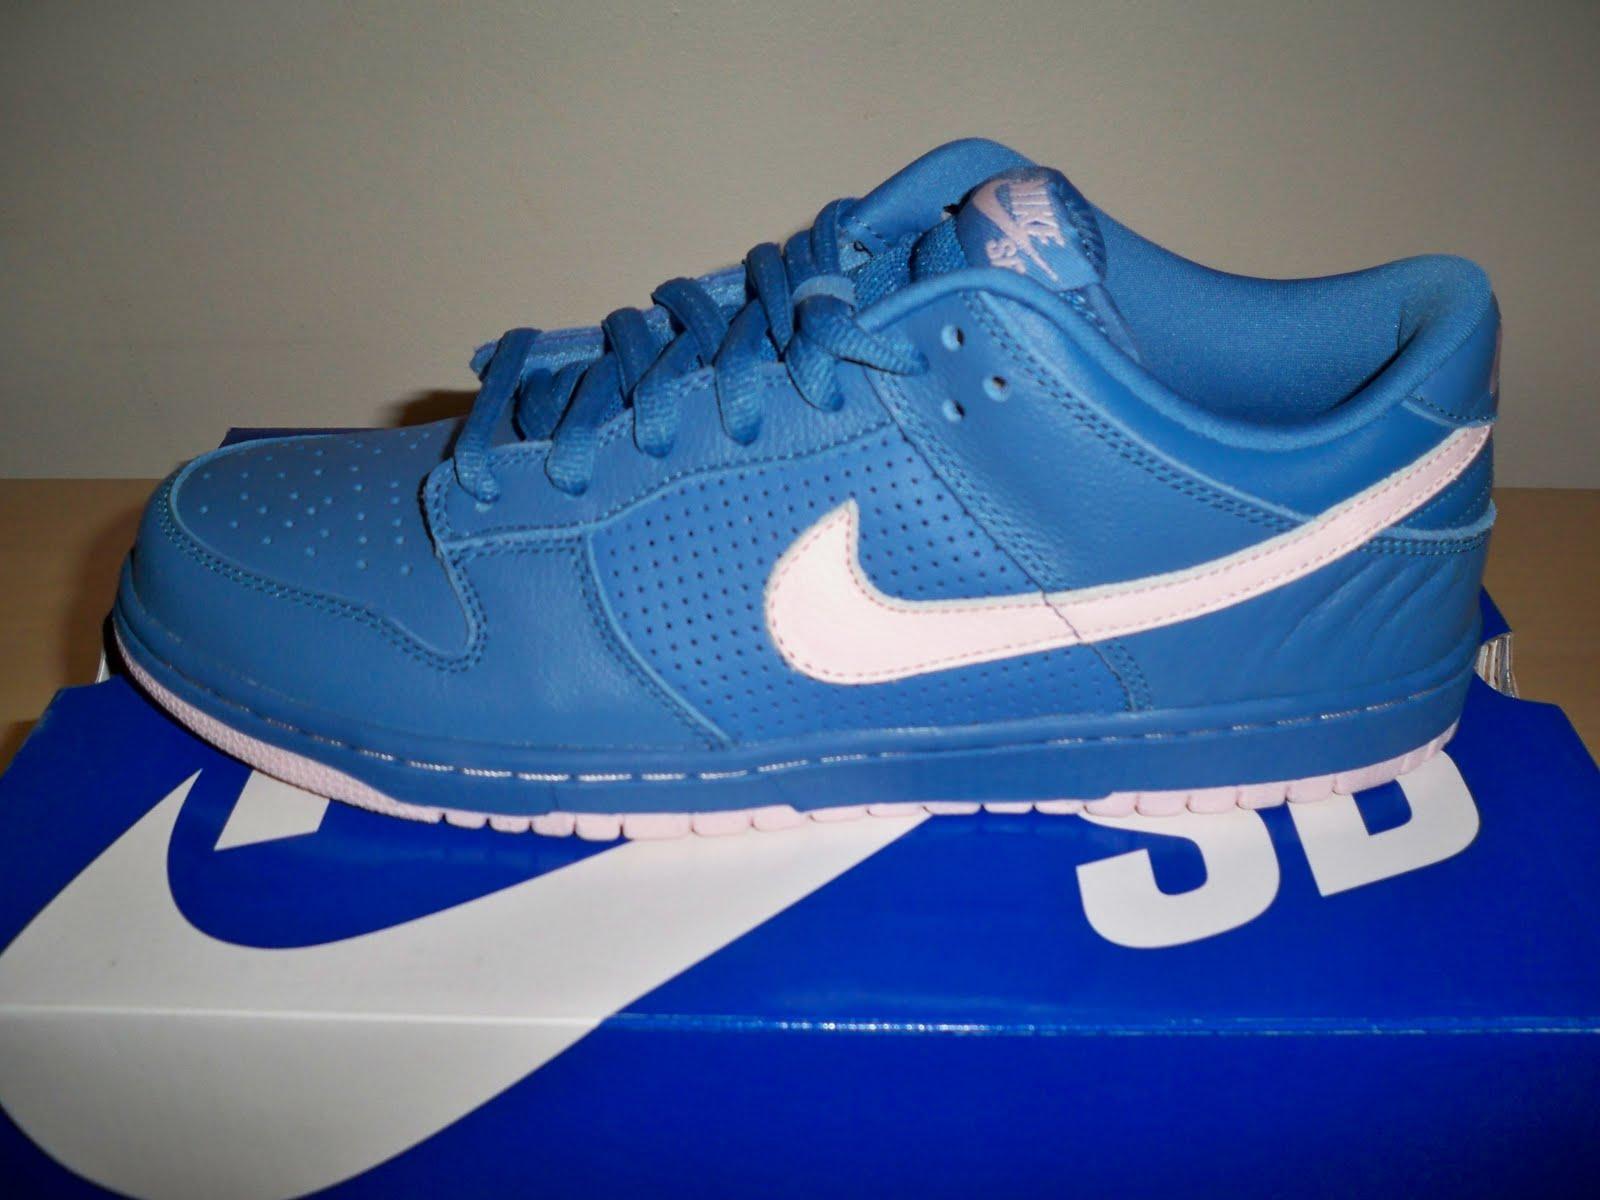 premium selection 14268 4bf09 SB Collection  Nike Dunk Low Pro SB